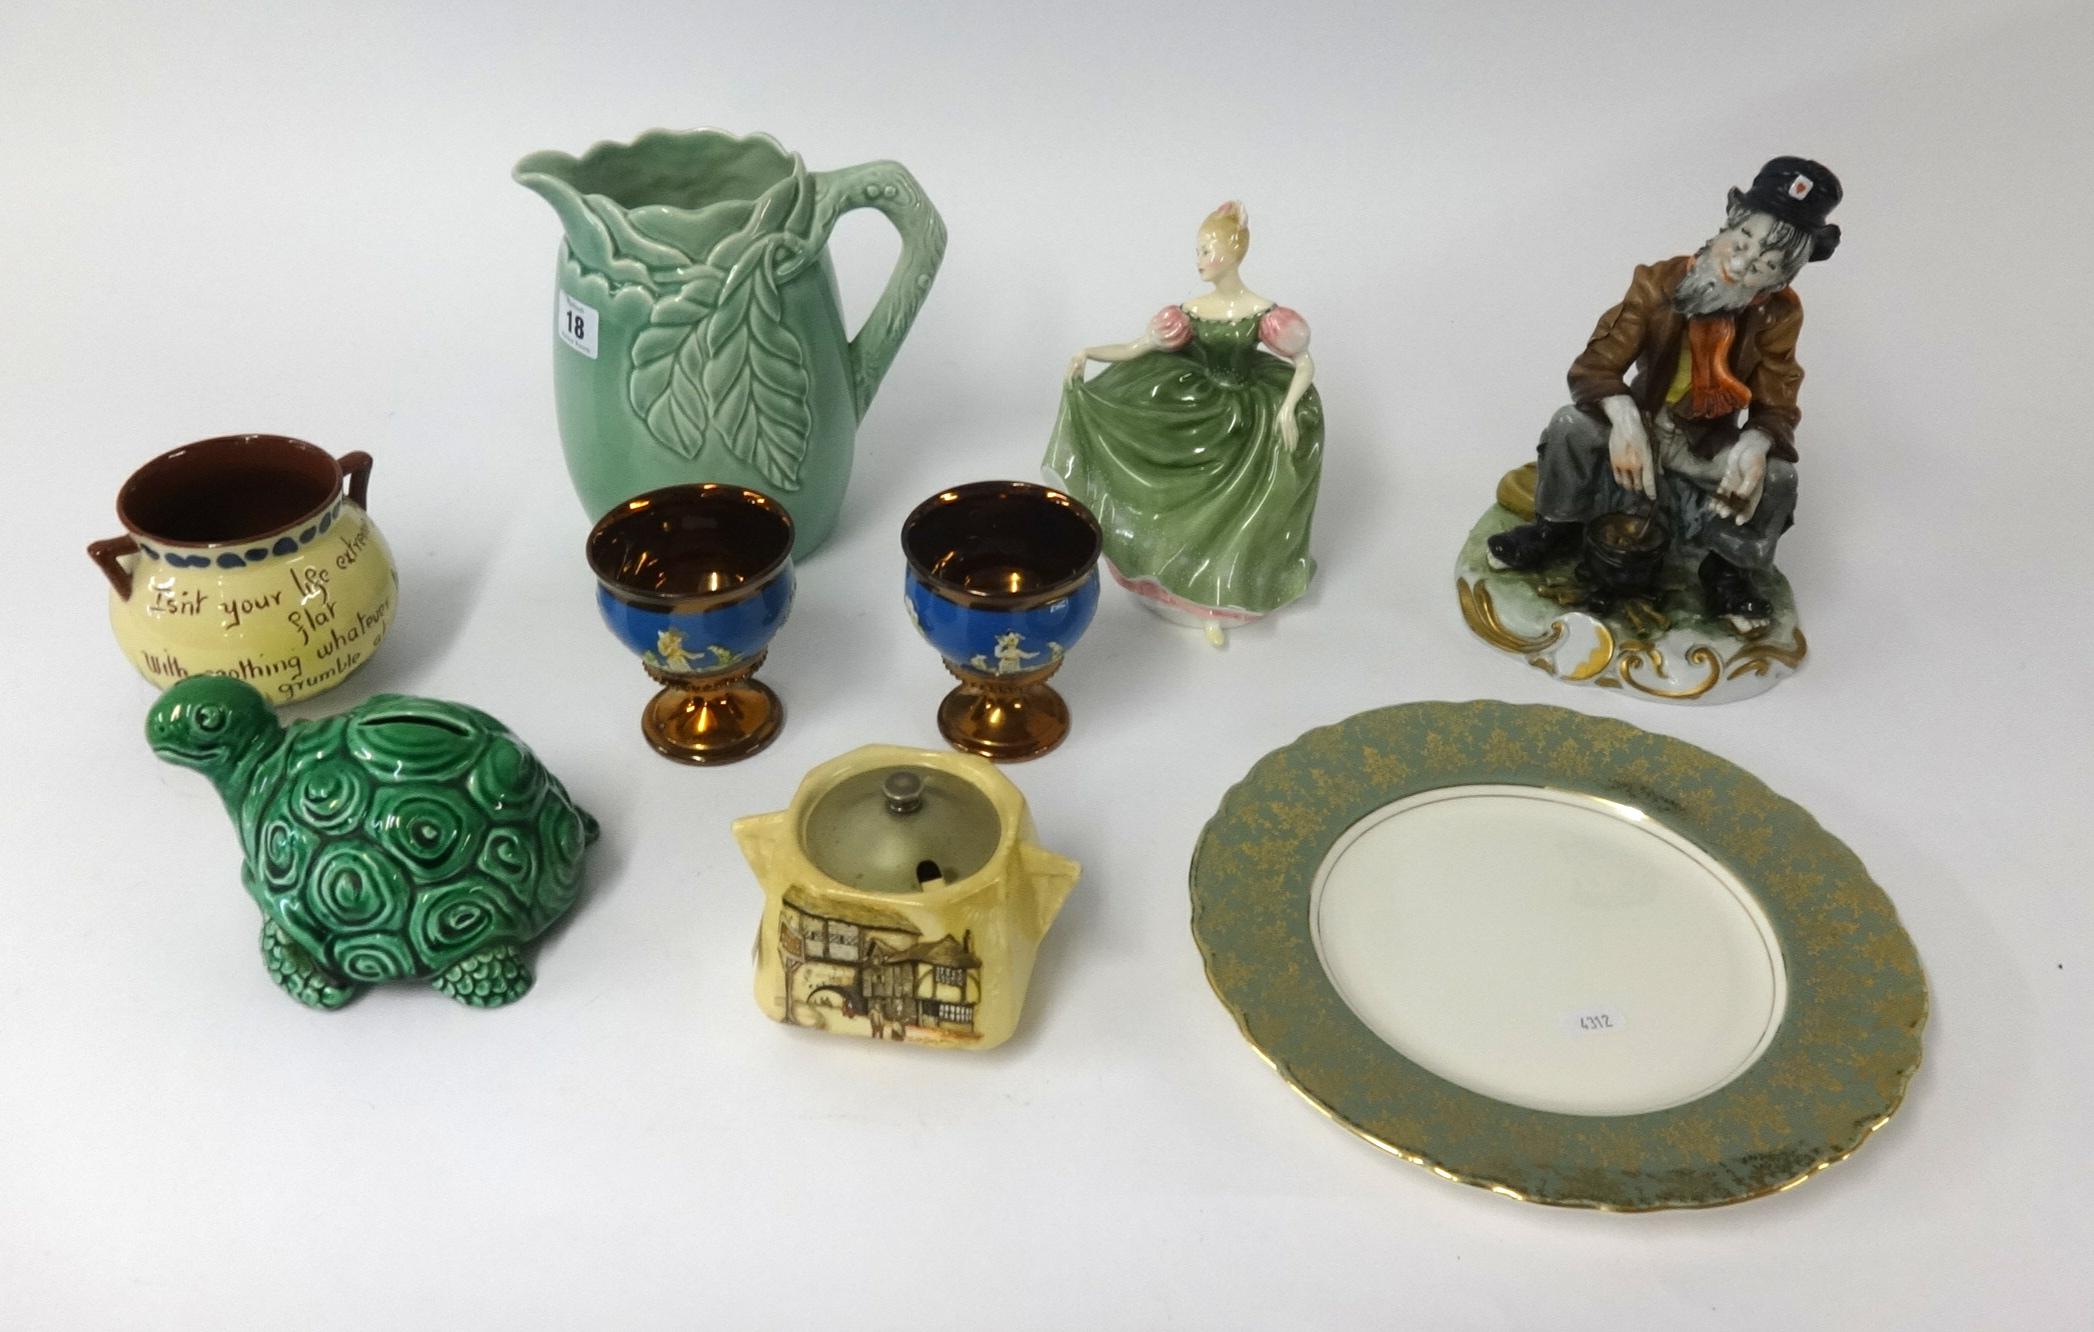 Lot 018 - A pair of Victorian copper lustre goblets, Torquay cockerel patterned cauldron, Doulton figure '